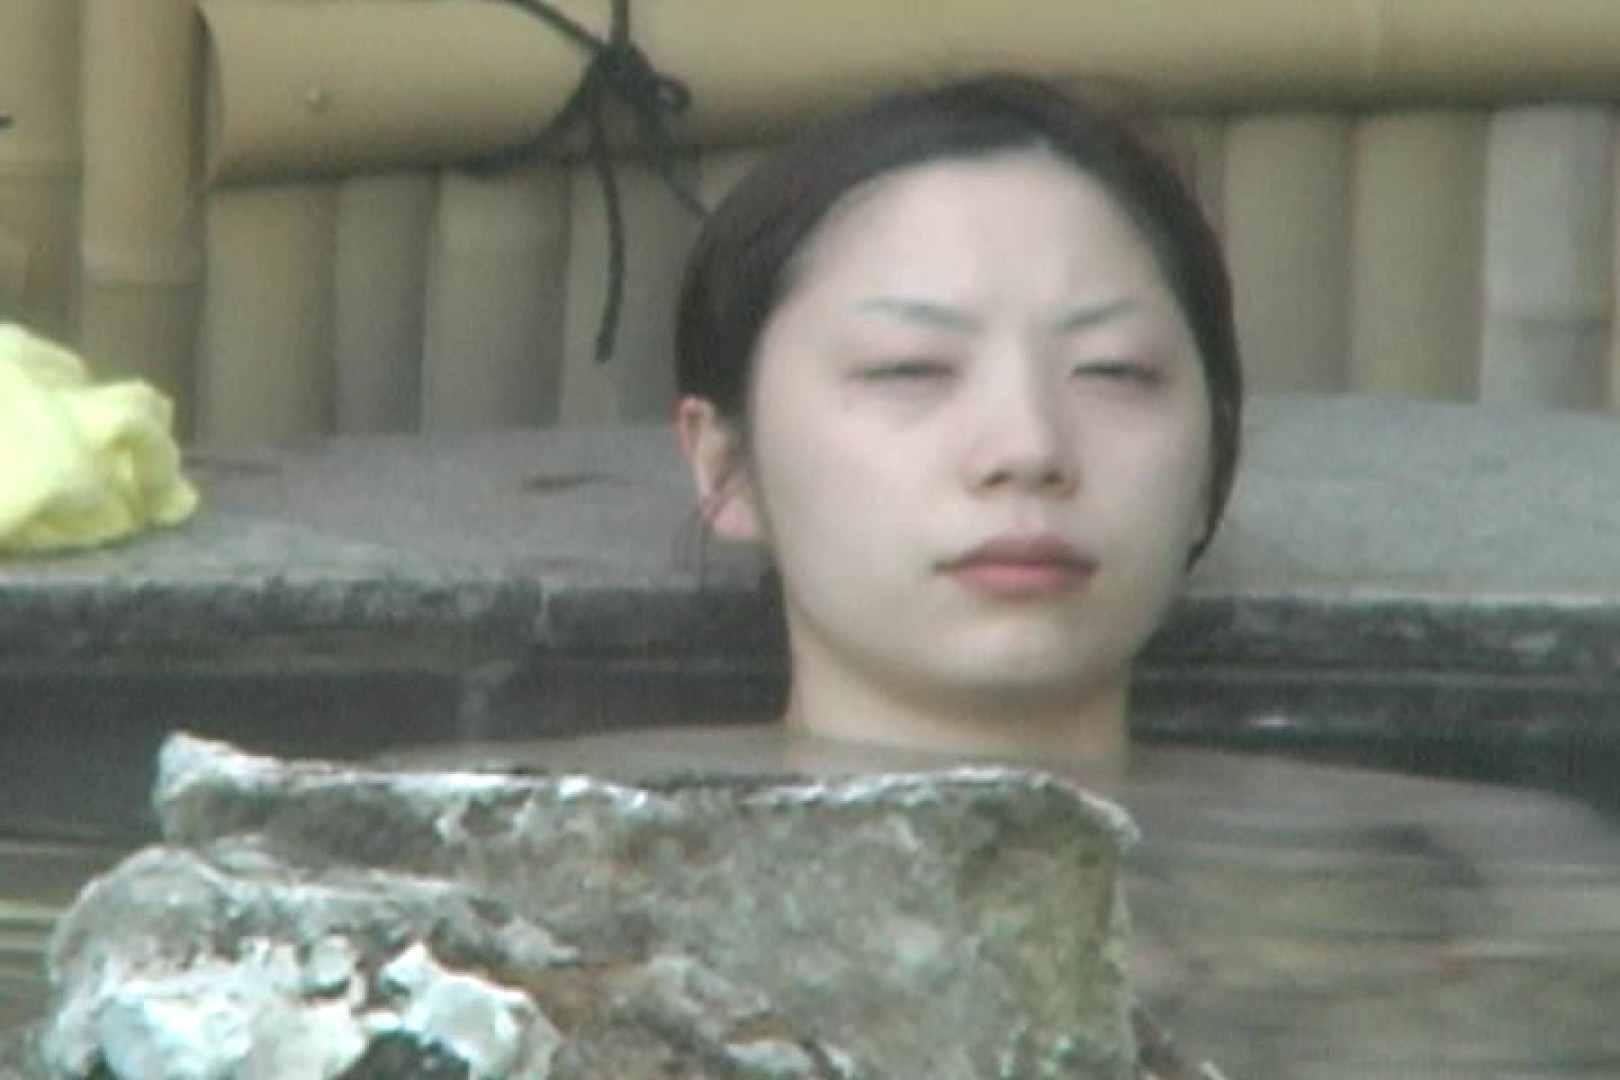 Aquaな露天風呂Vol.596 盗撮シリーズ | 露天風呂編  113PIX 59